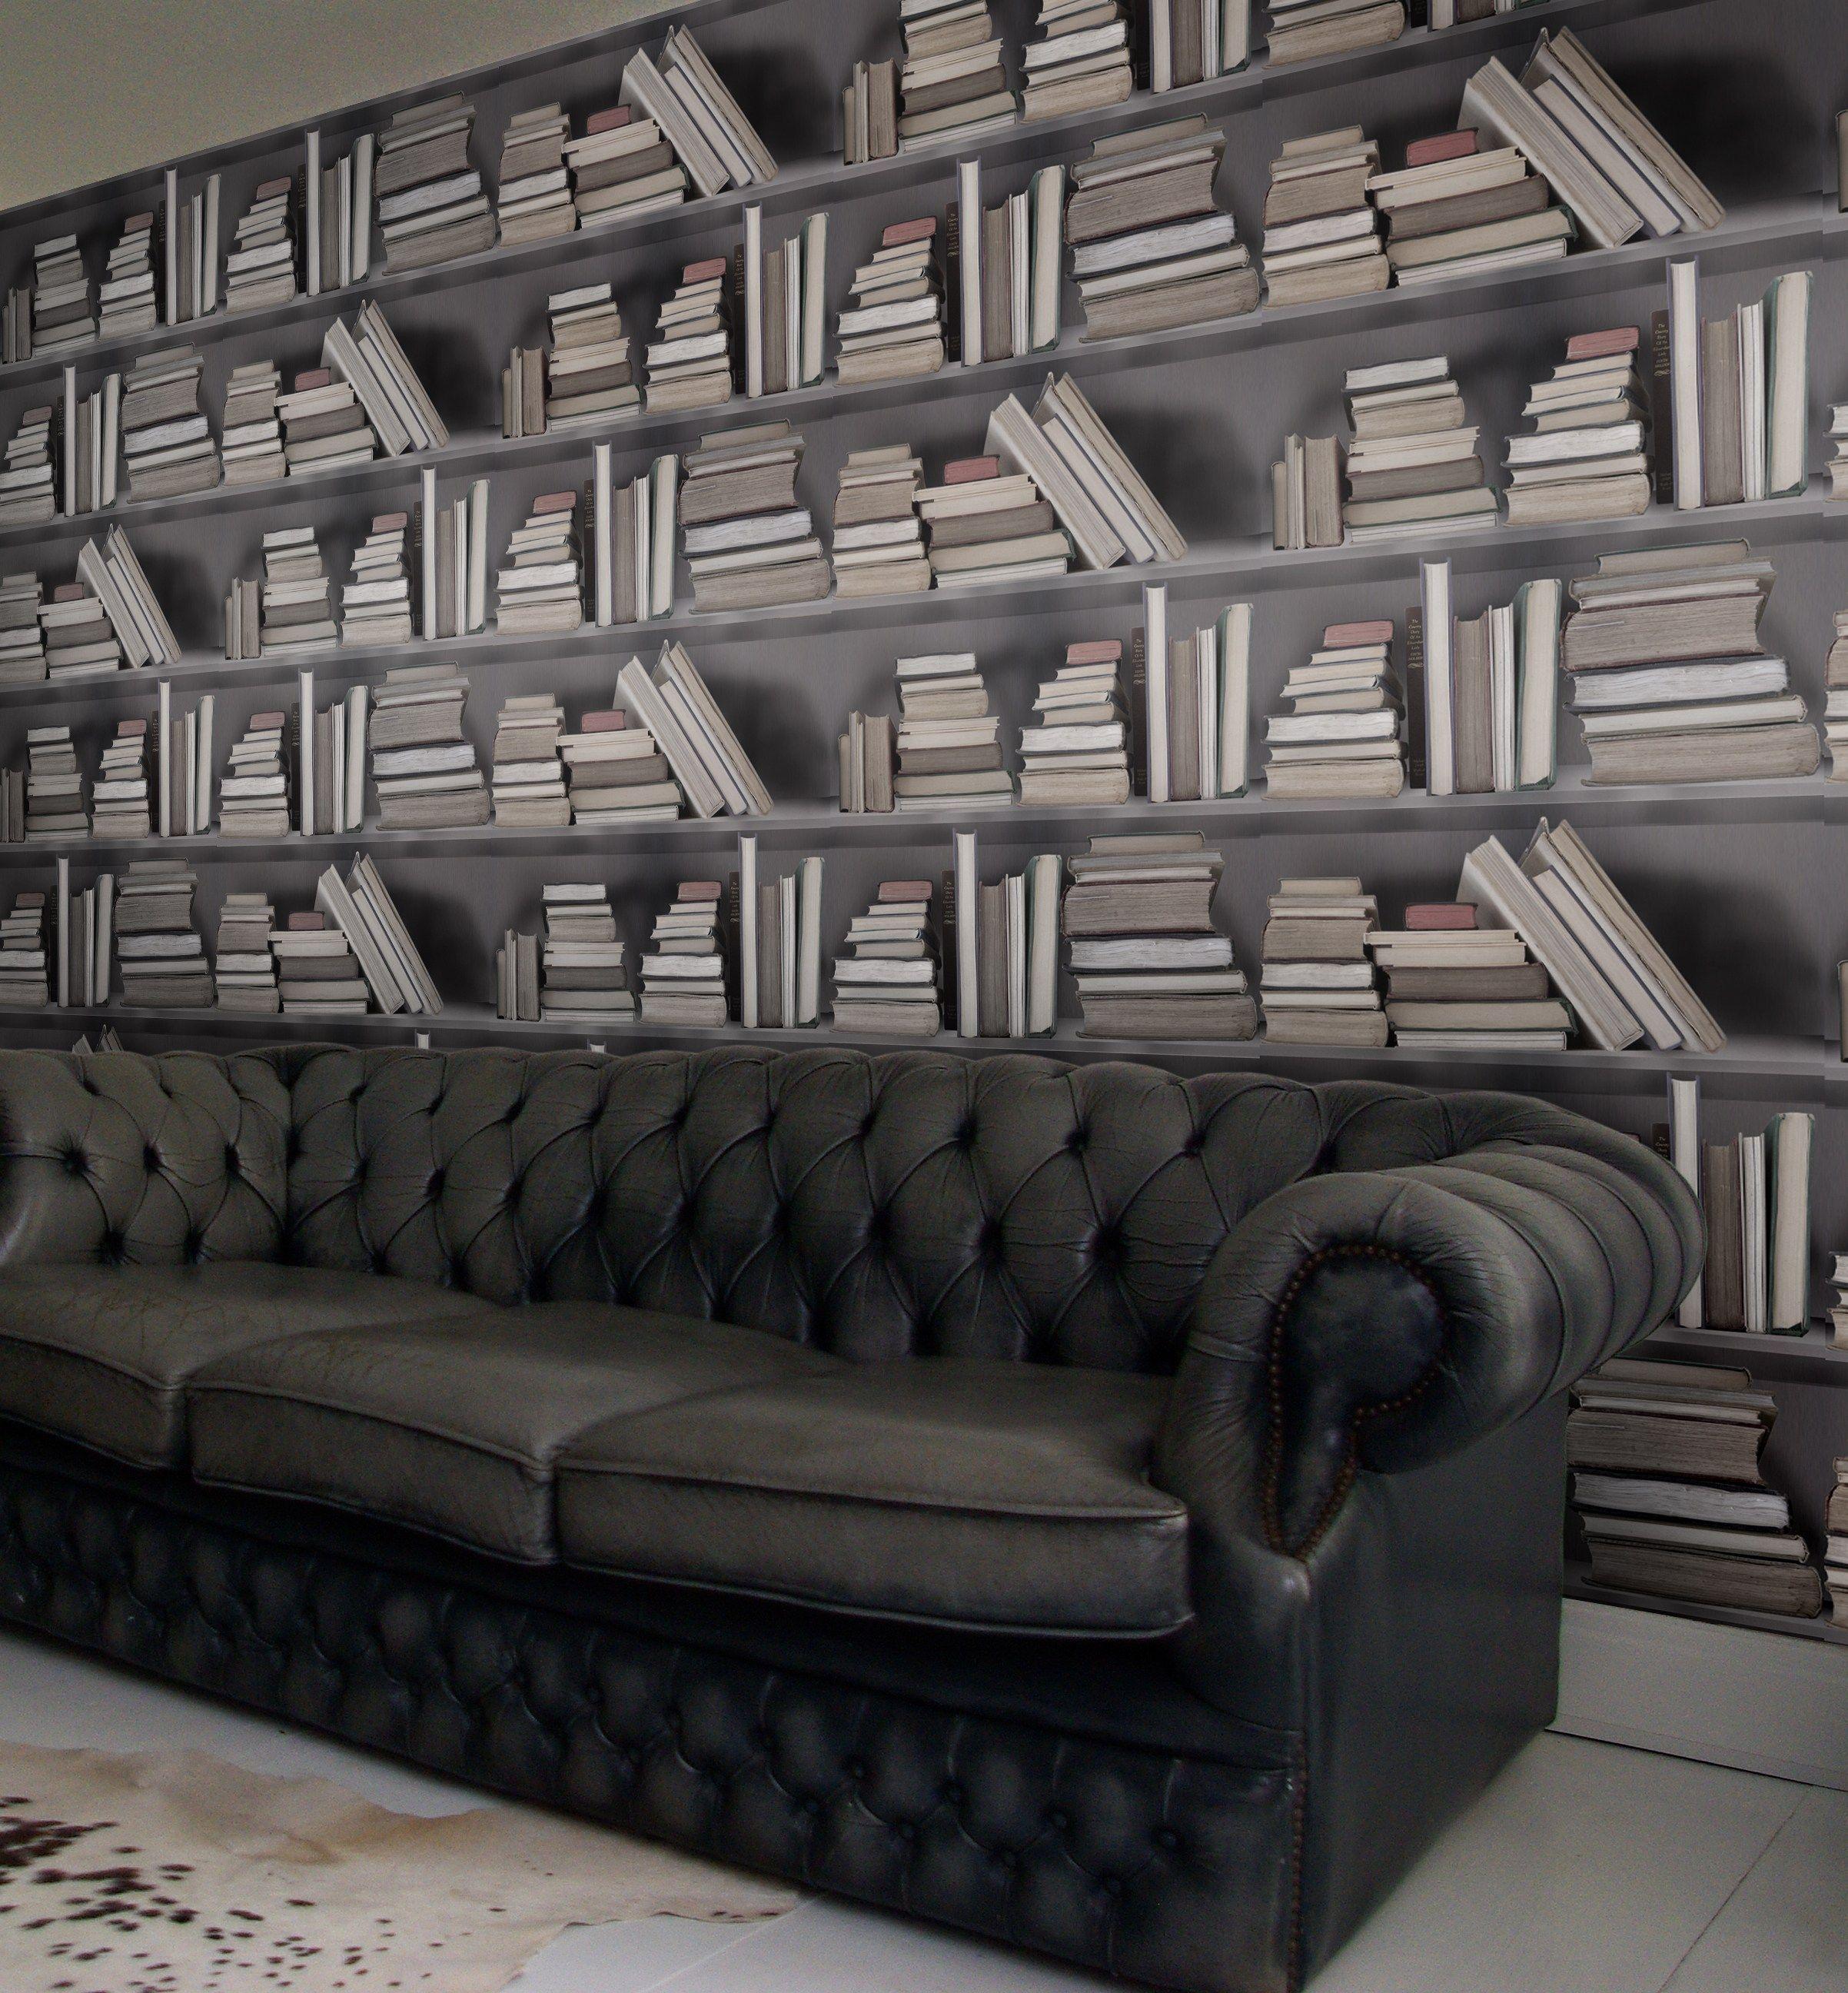 carta da parati trompe l 39 oeil vintage bookshelf by mineheart. Black Bedroom Furniture Sets. Home Design Ideas